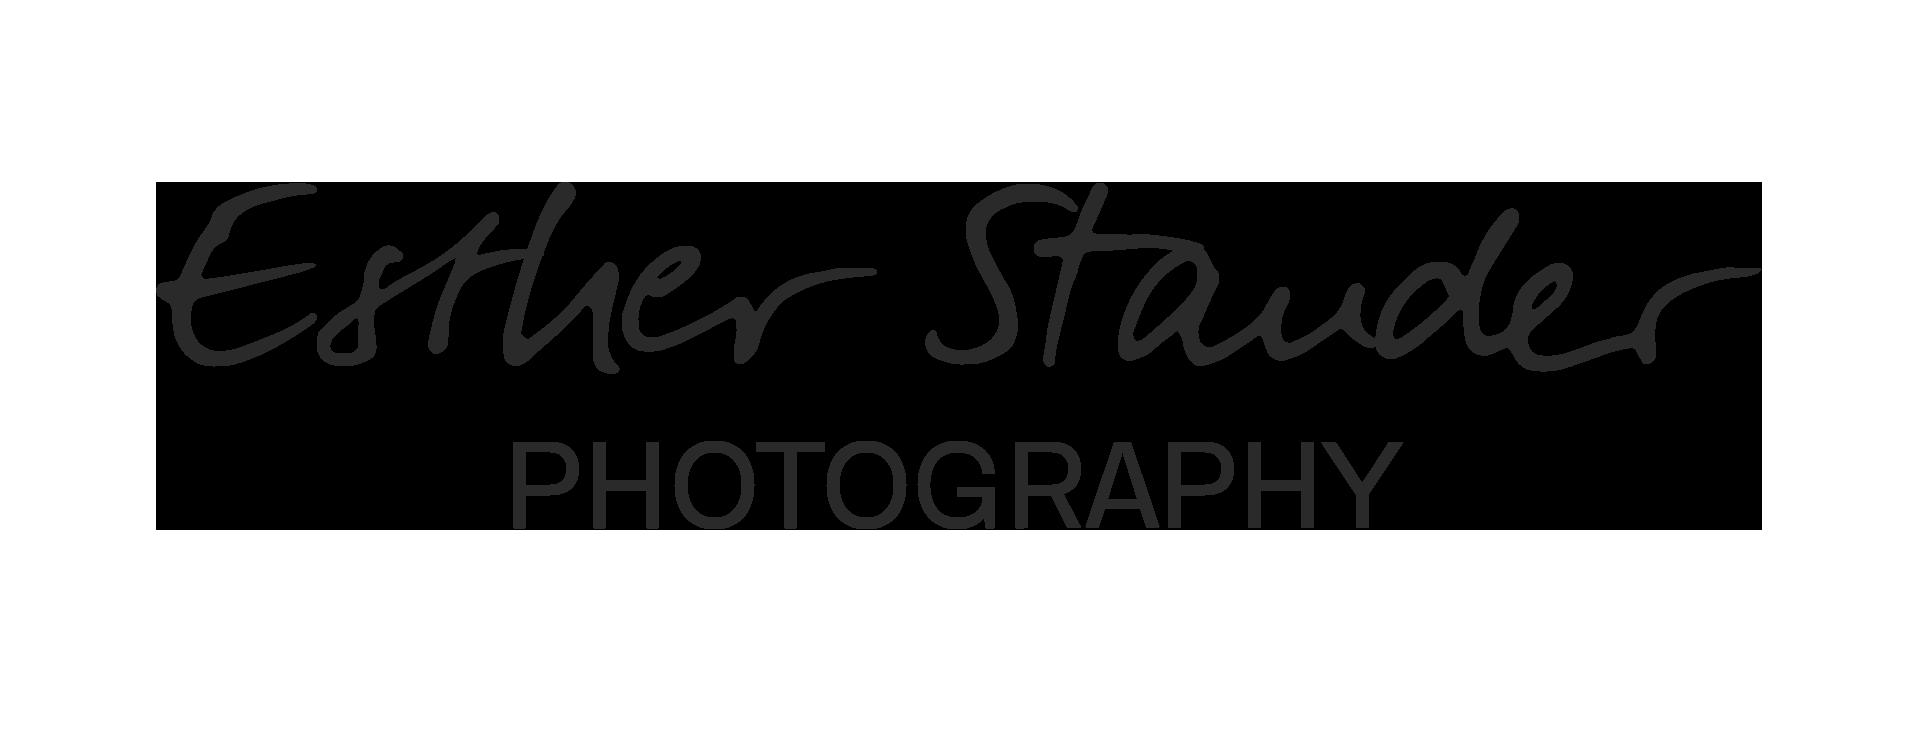 Esther Stauder Photography